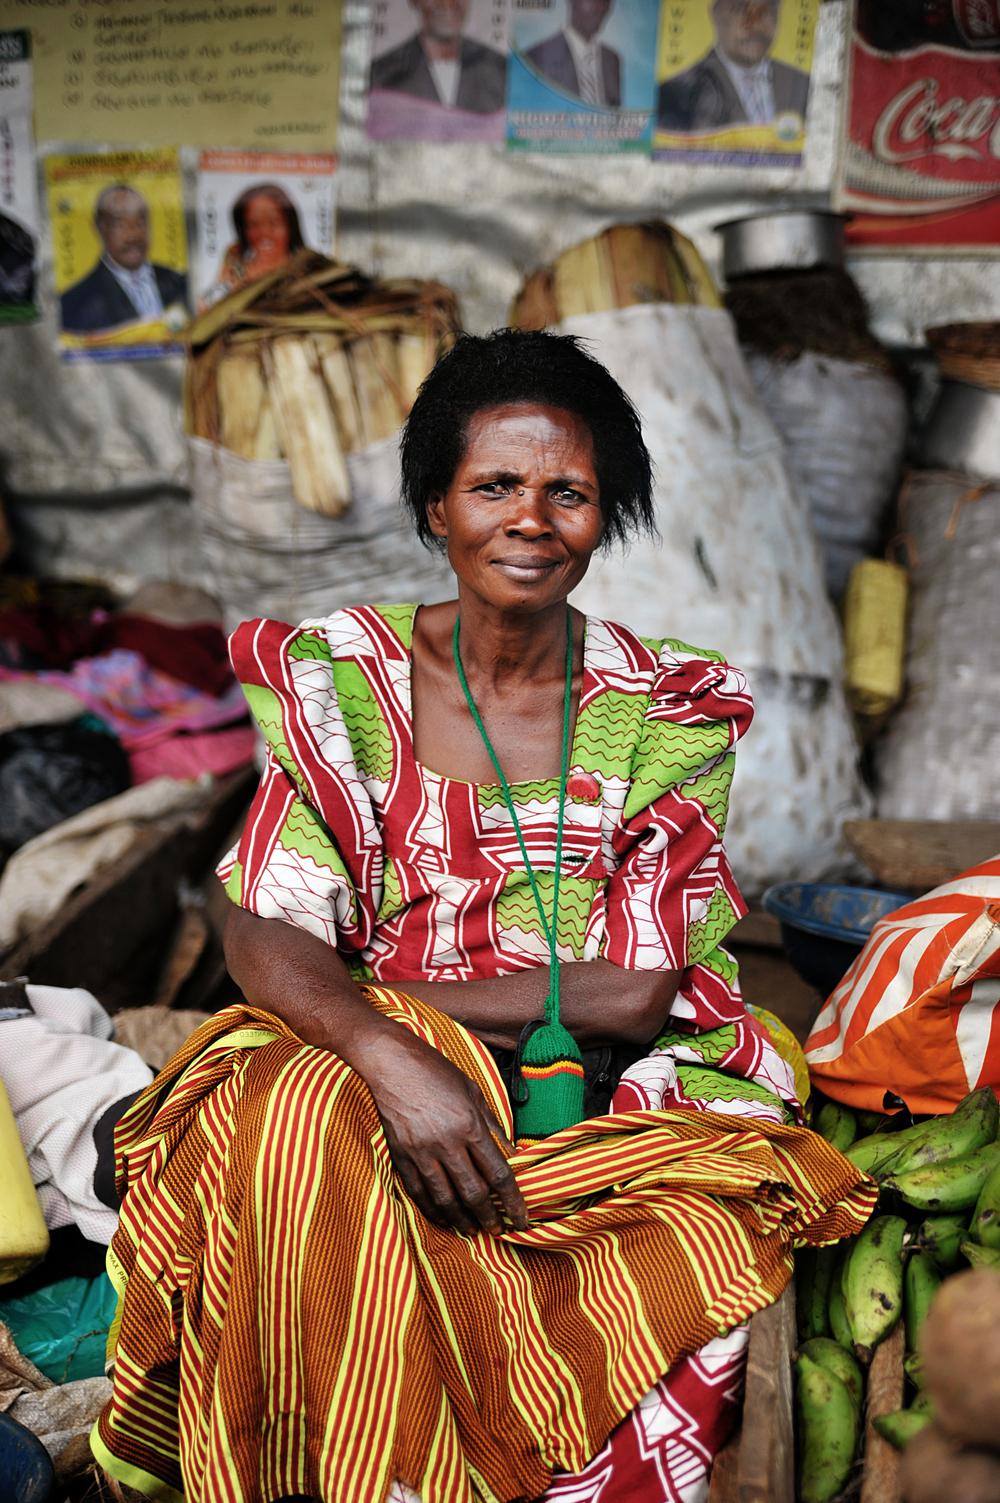 Vendor, Uganda_DSC_3282a.jpg